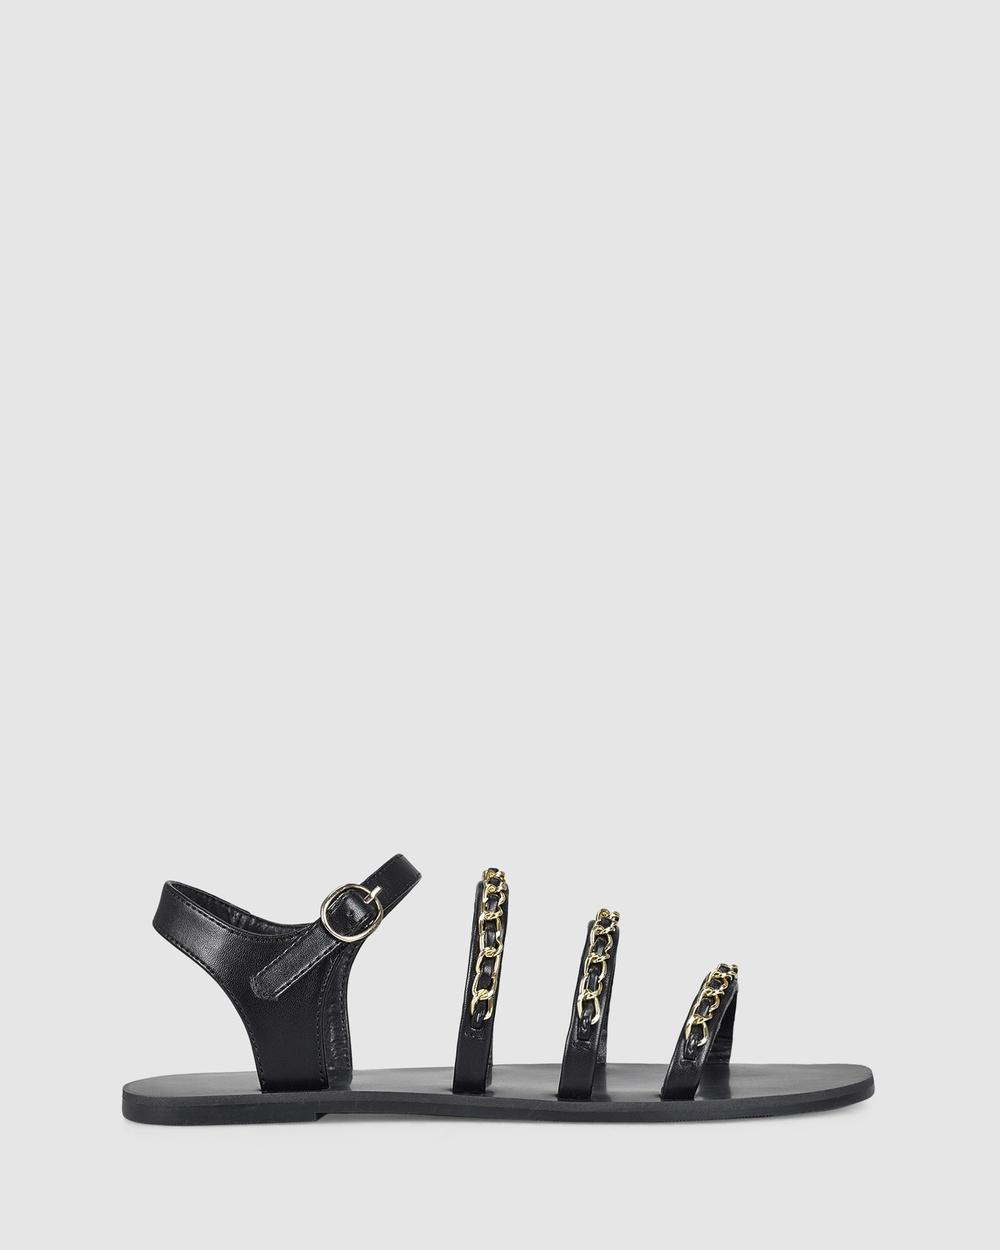 Verali Candice Sandals Black